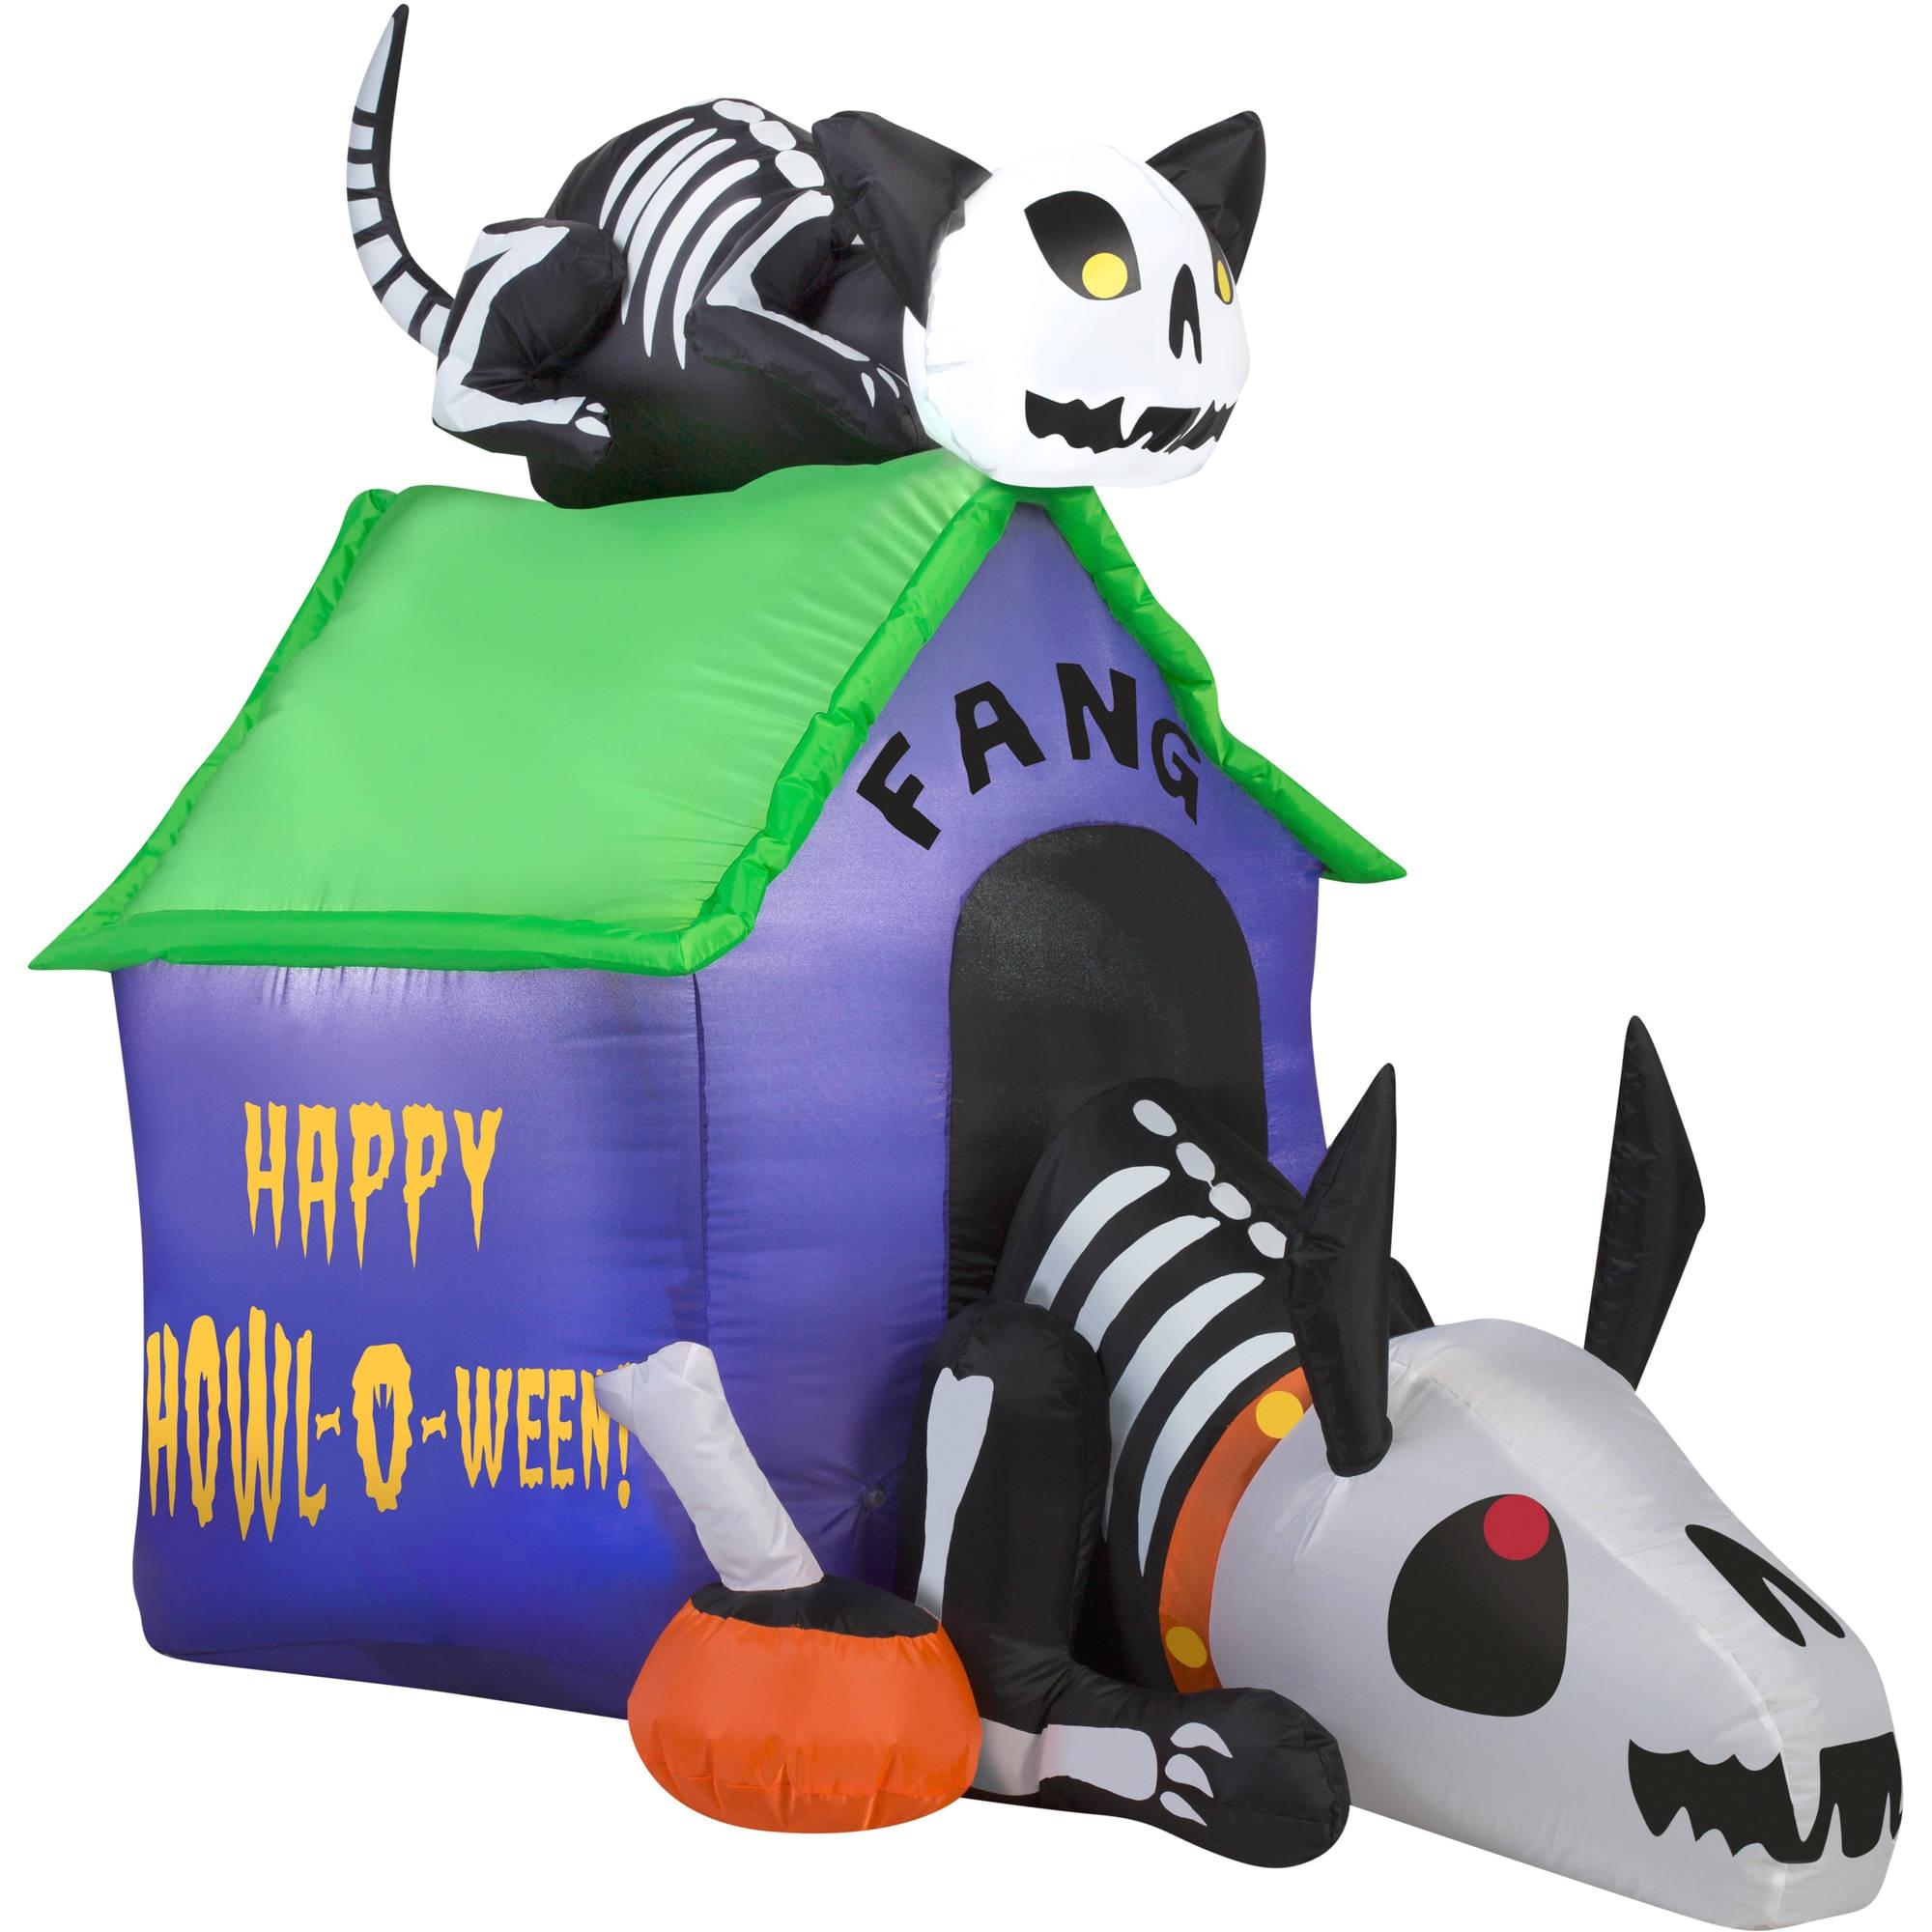 gemmy airblown inflatable 3 5 x 4 5 skeleton dog and cat halloween decoration walmart com